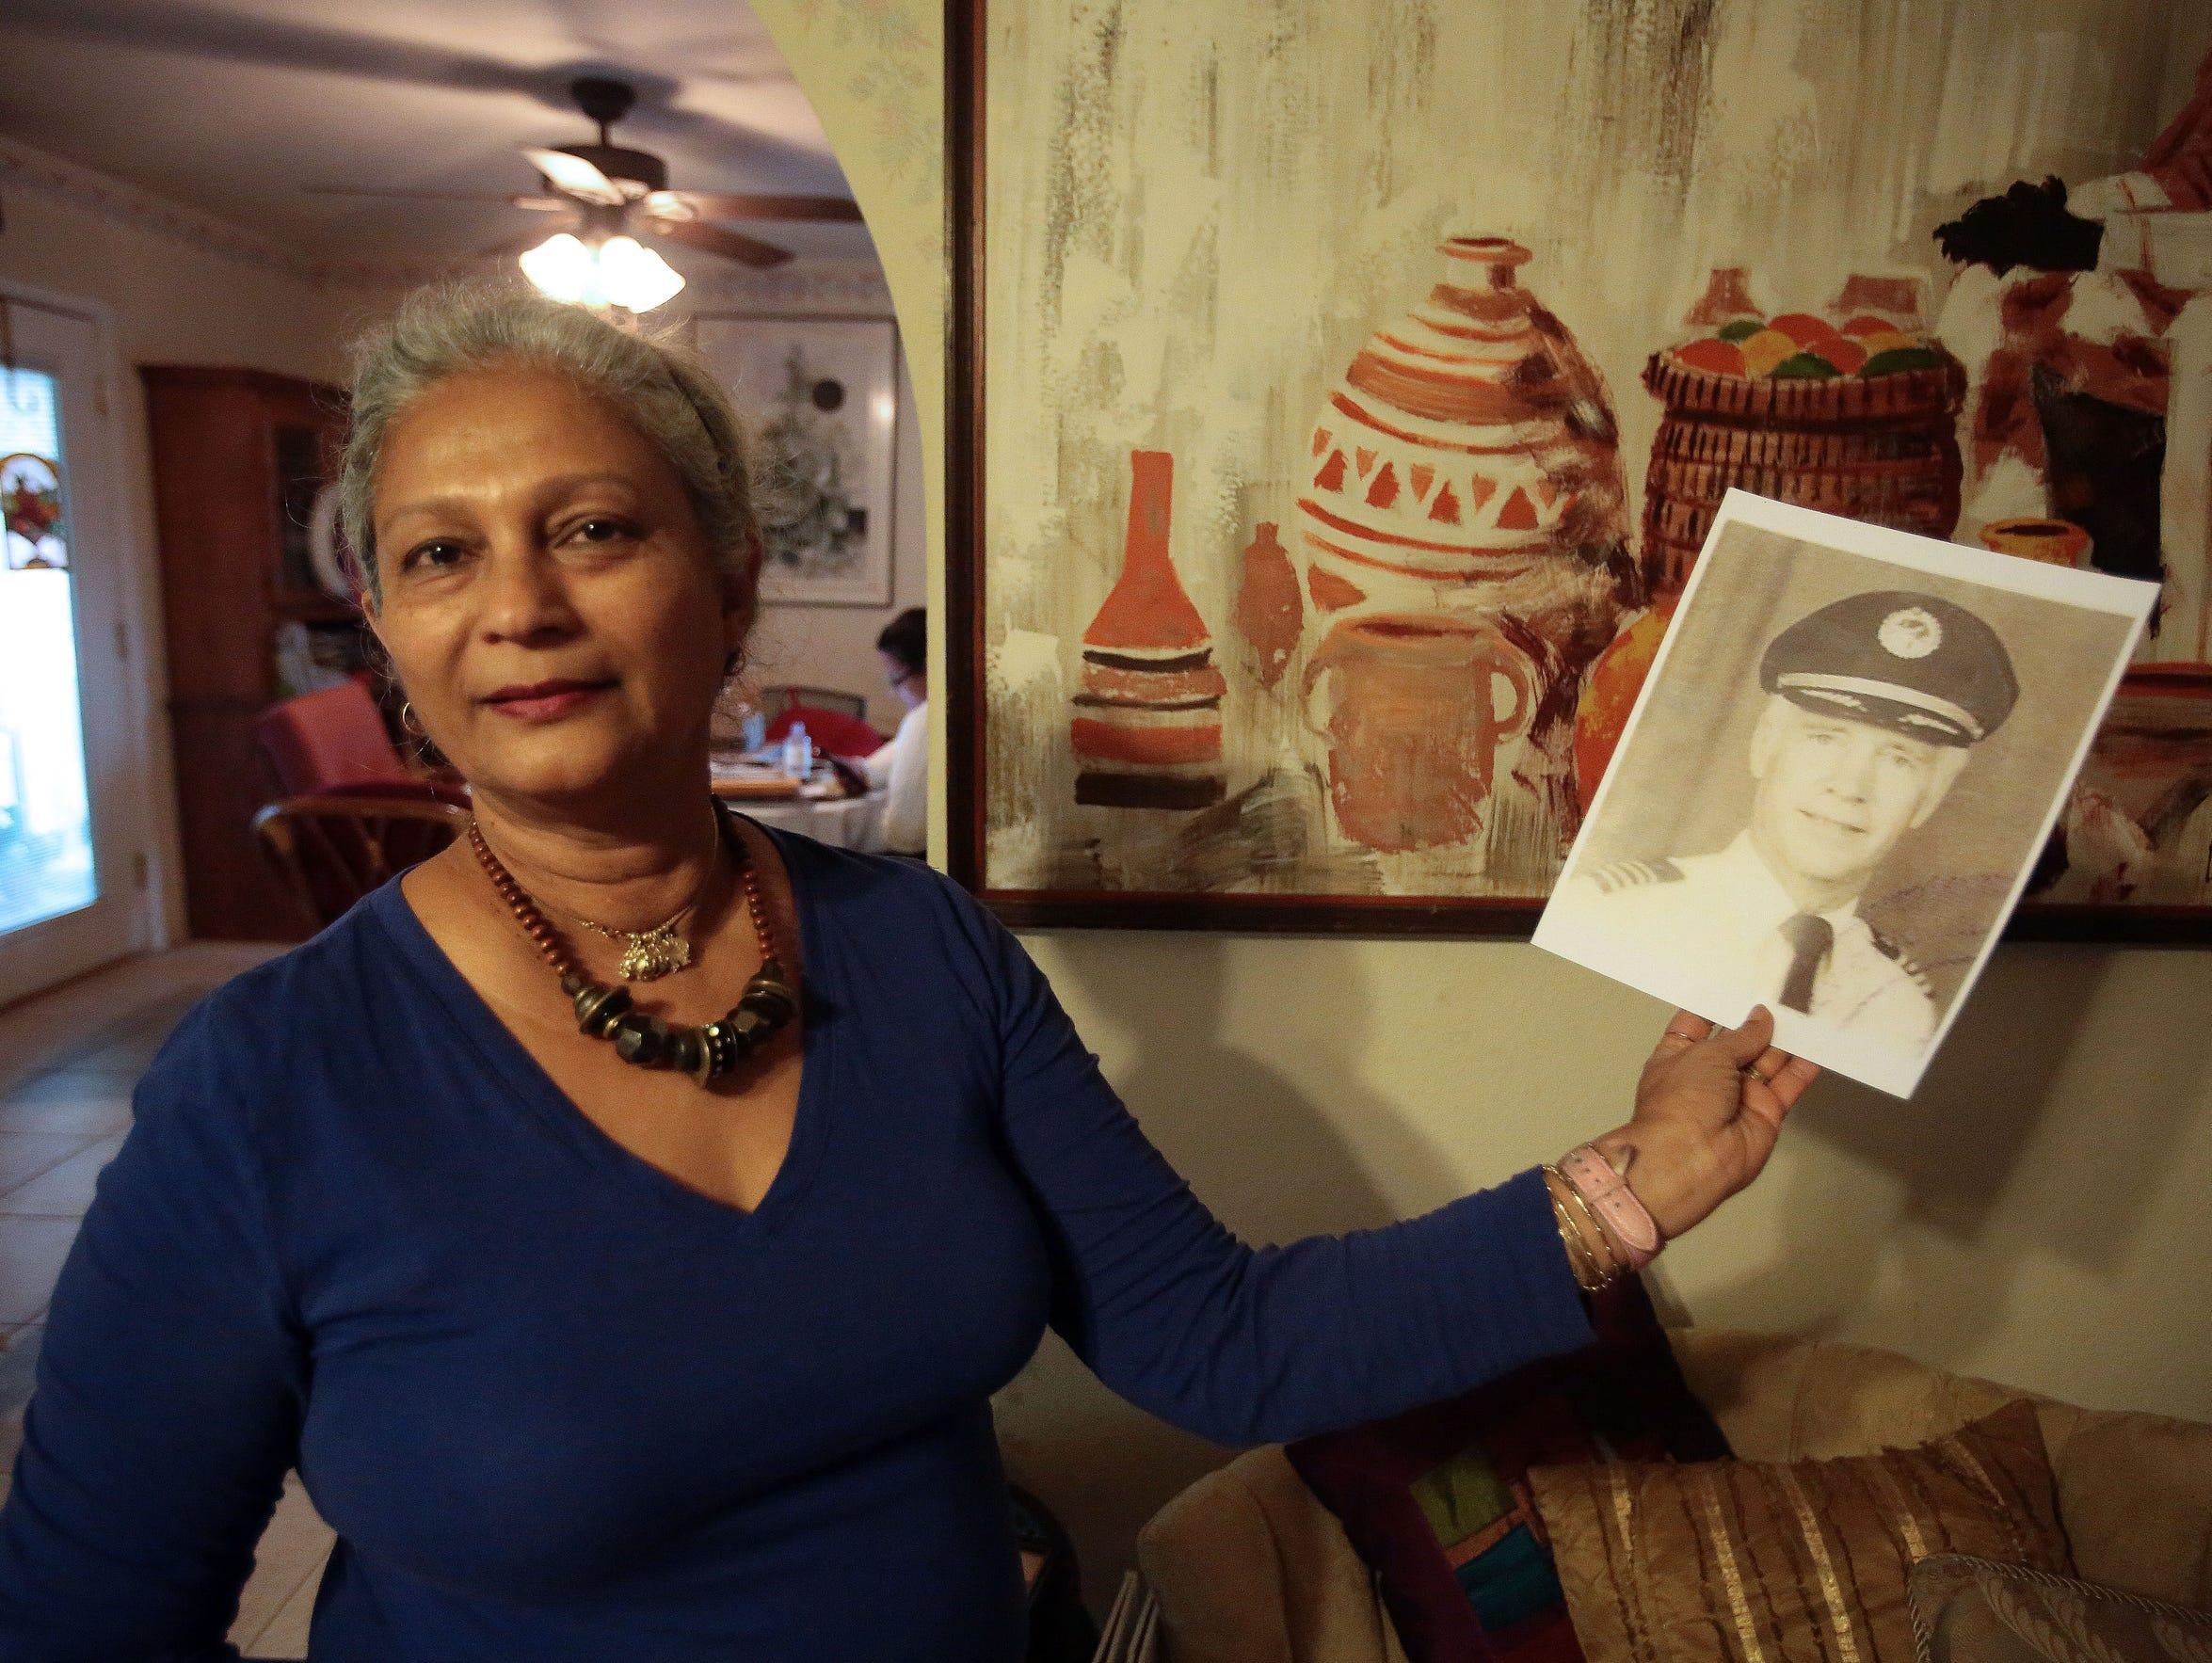 Candi Lindig holds a photo of her husband David Lindig